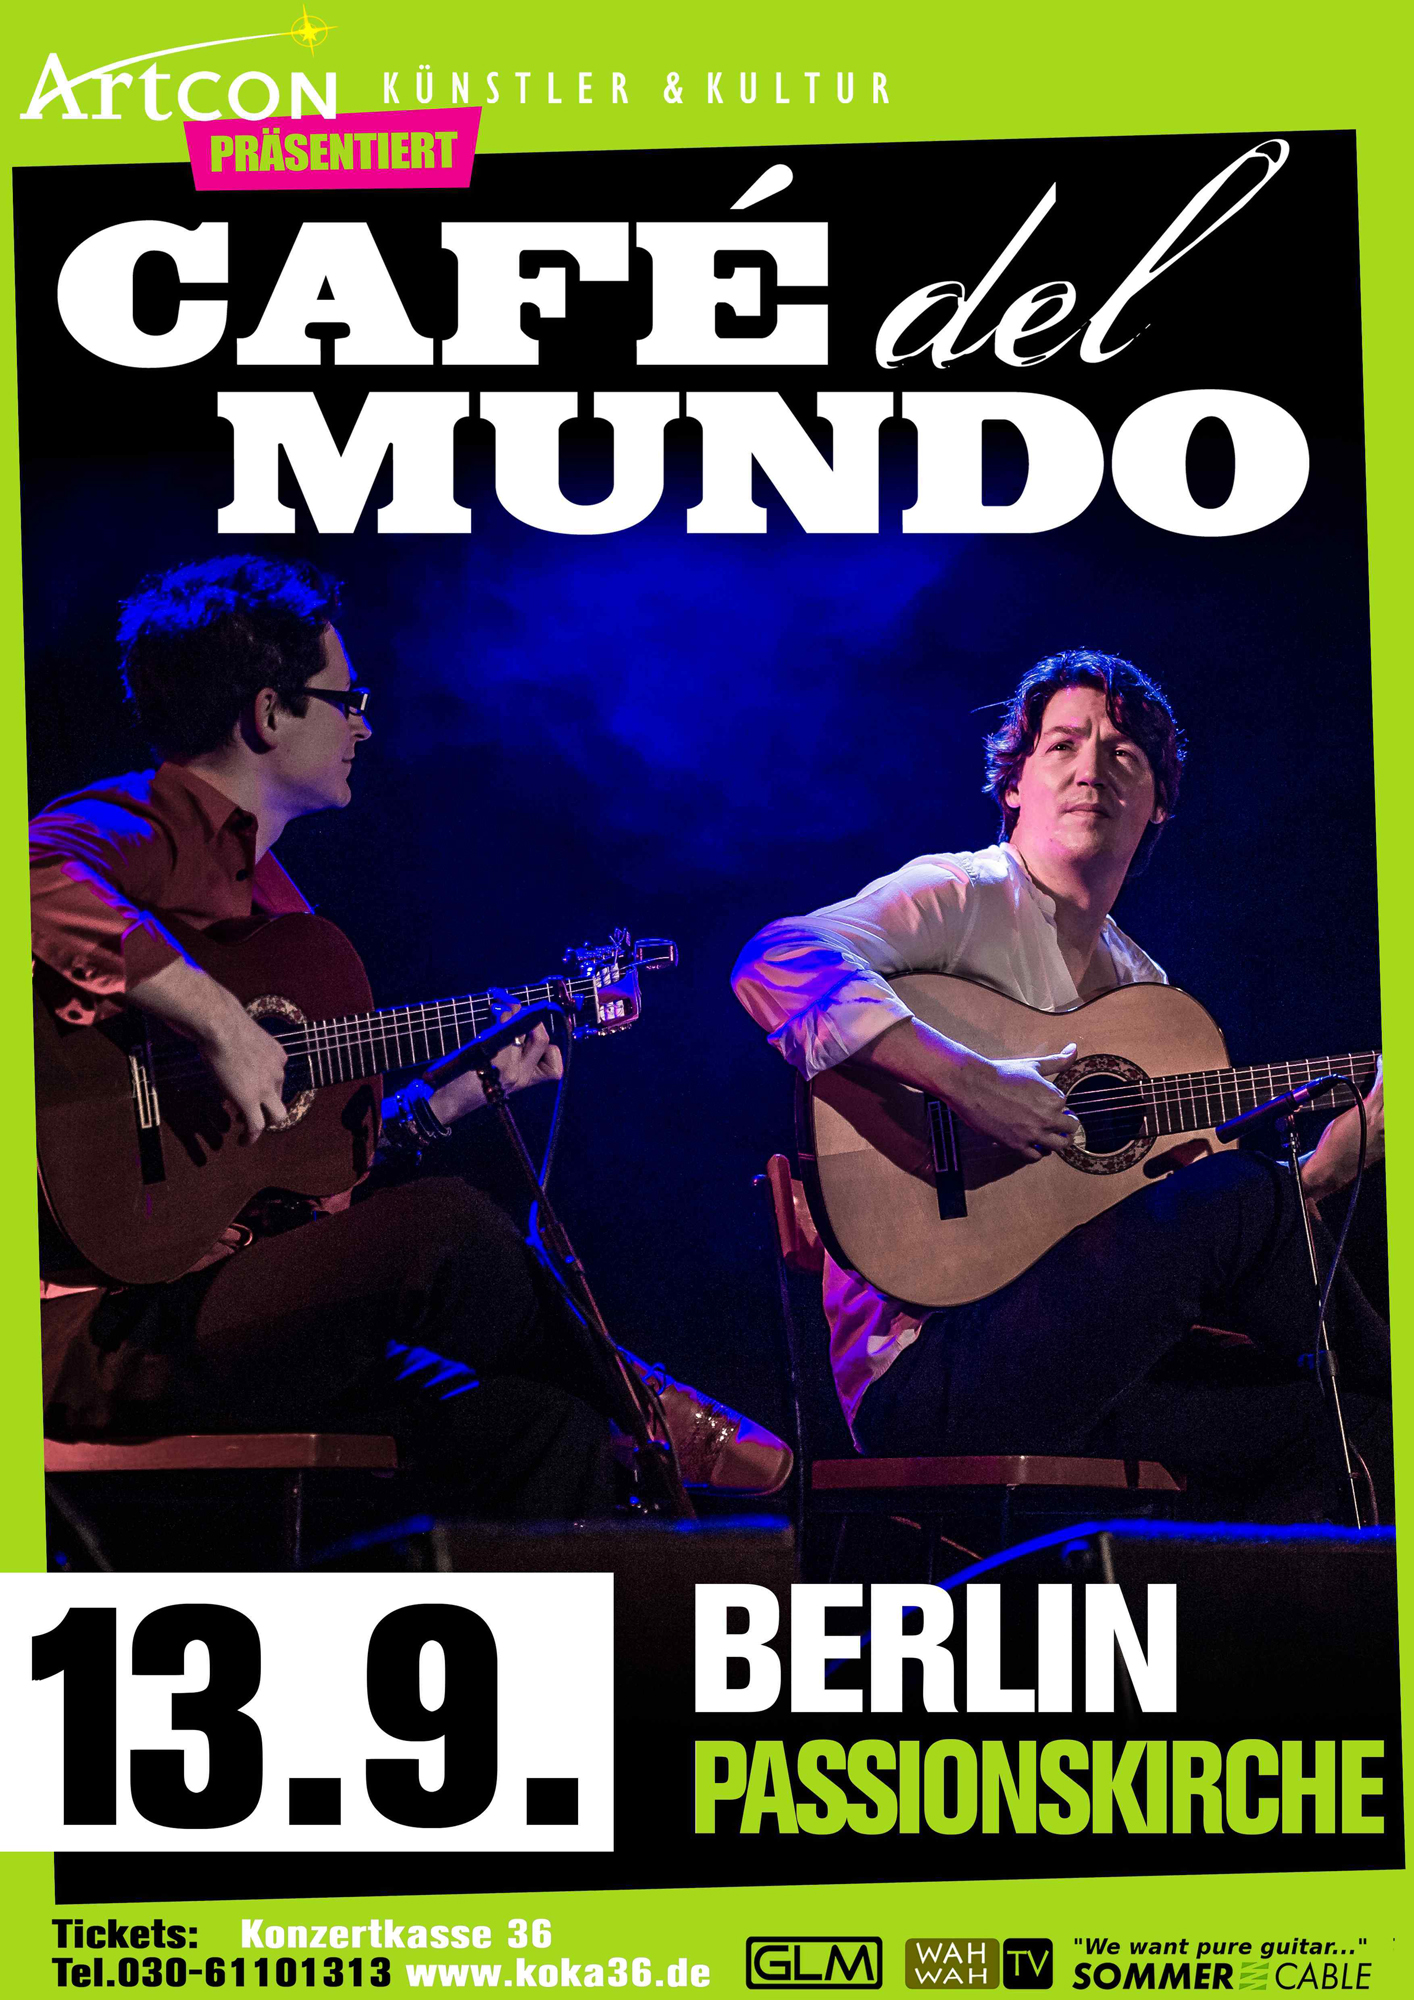 cafe del mundo Berlin_k